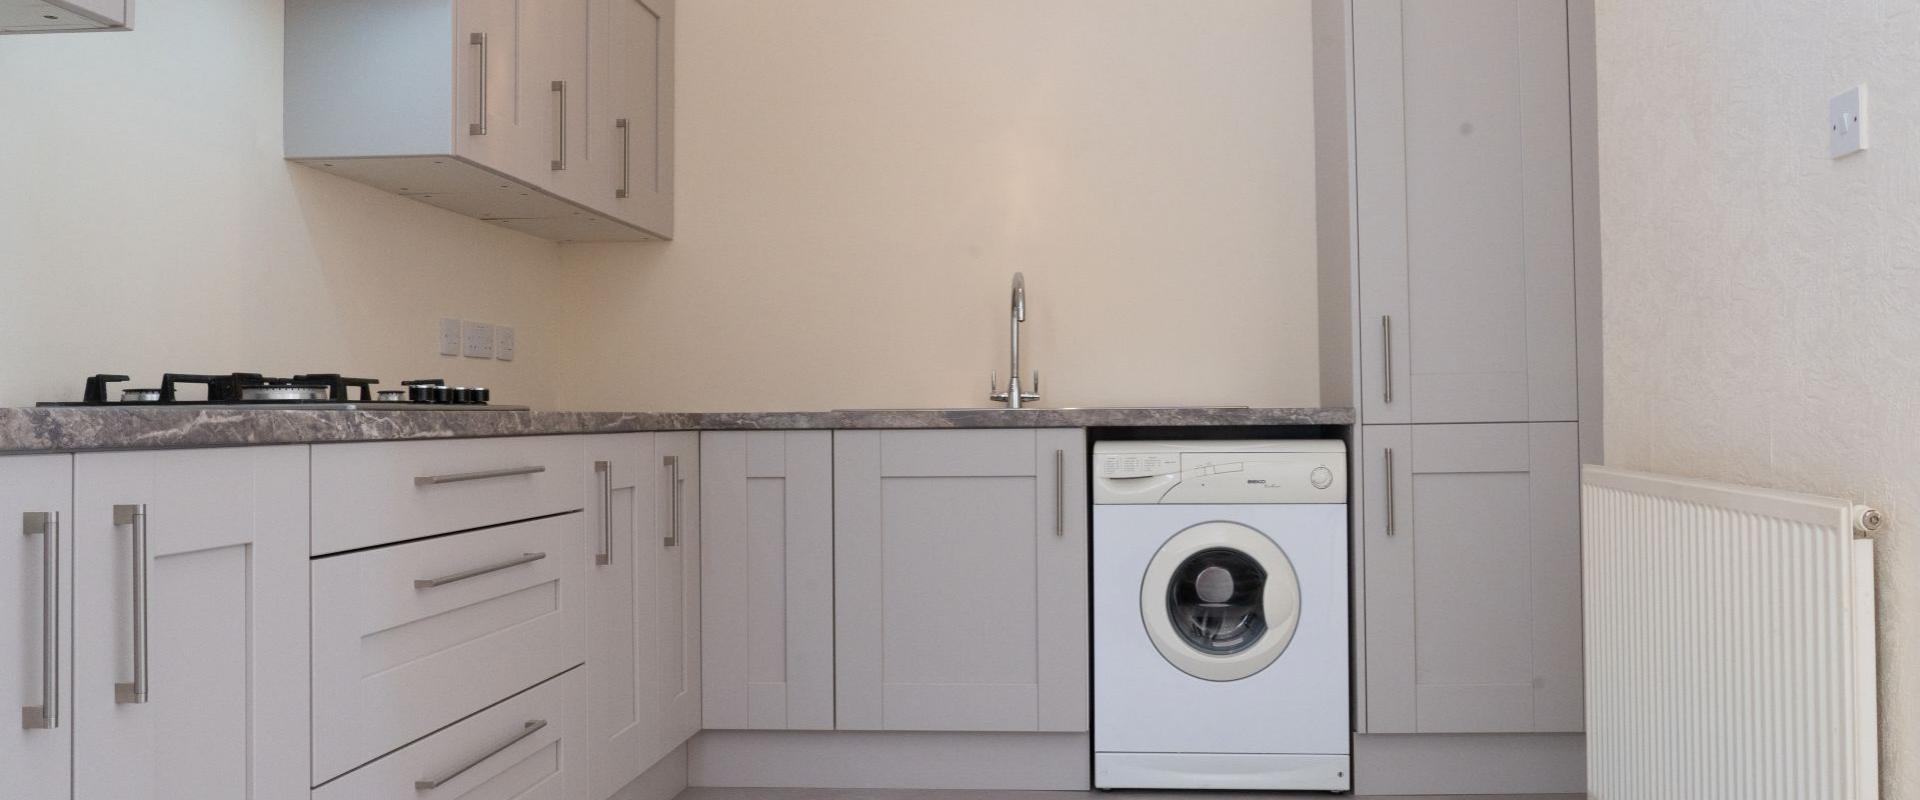 ARD-Properties-Development-Sites-Buy-Homes-Rent-Aberdeenshire-Rentals-2a-St-Andrew-Streeet-Peterhead-Banner (11)